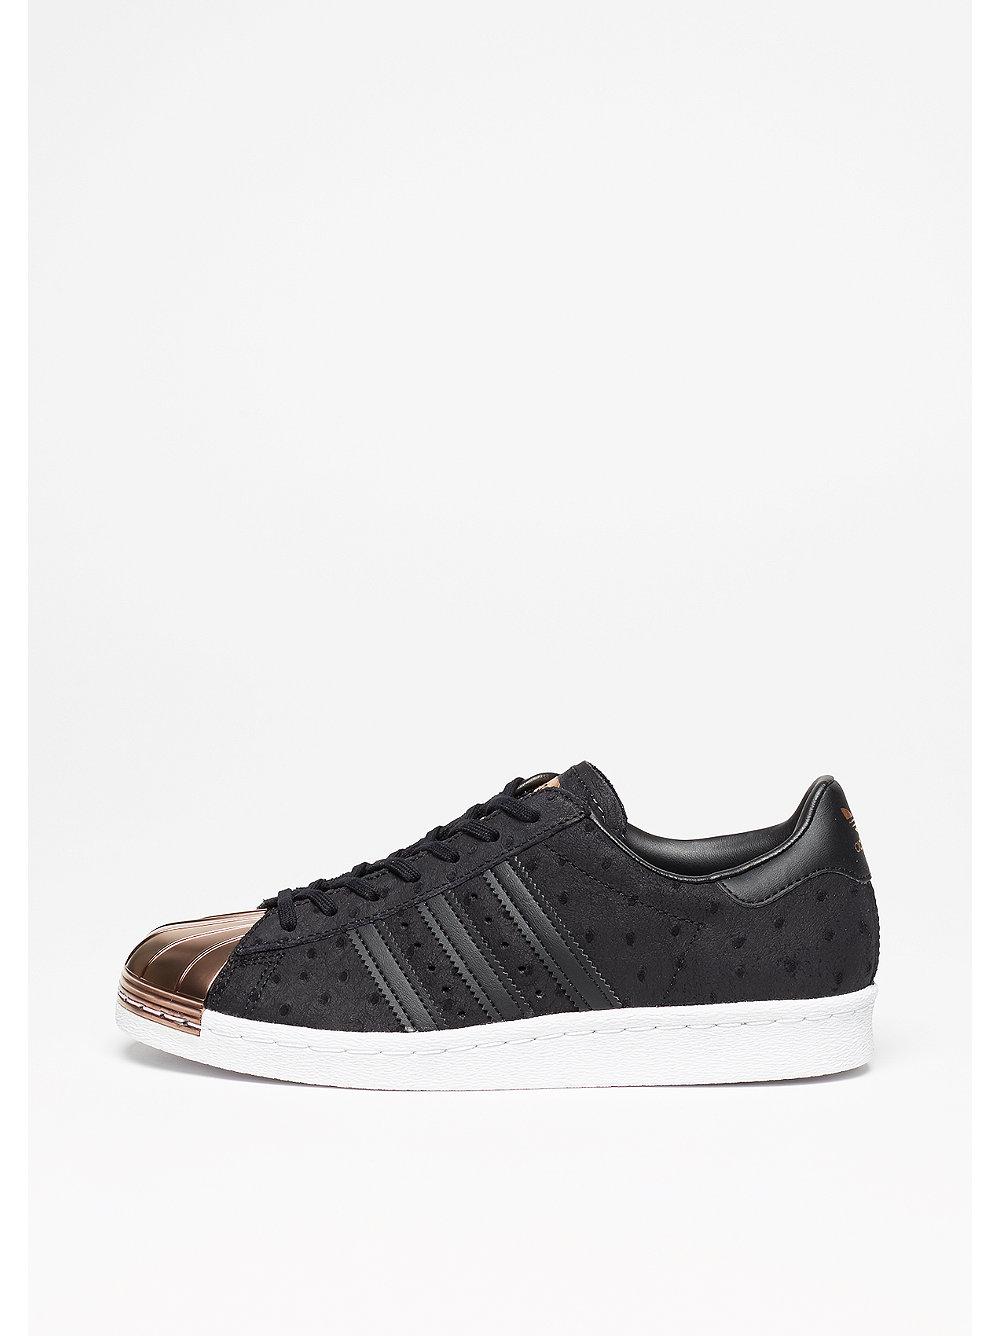 adidas Superstar 80s Metal Toe core black-core black-vapour grey